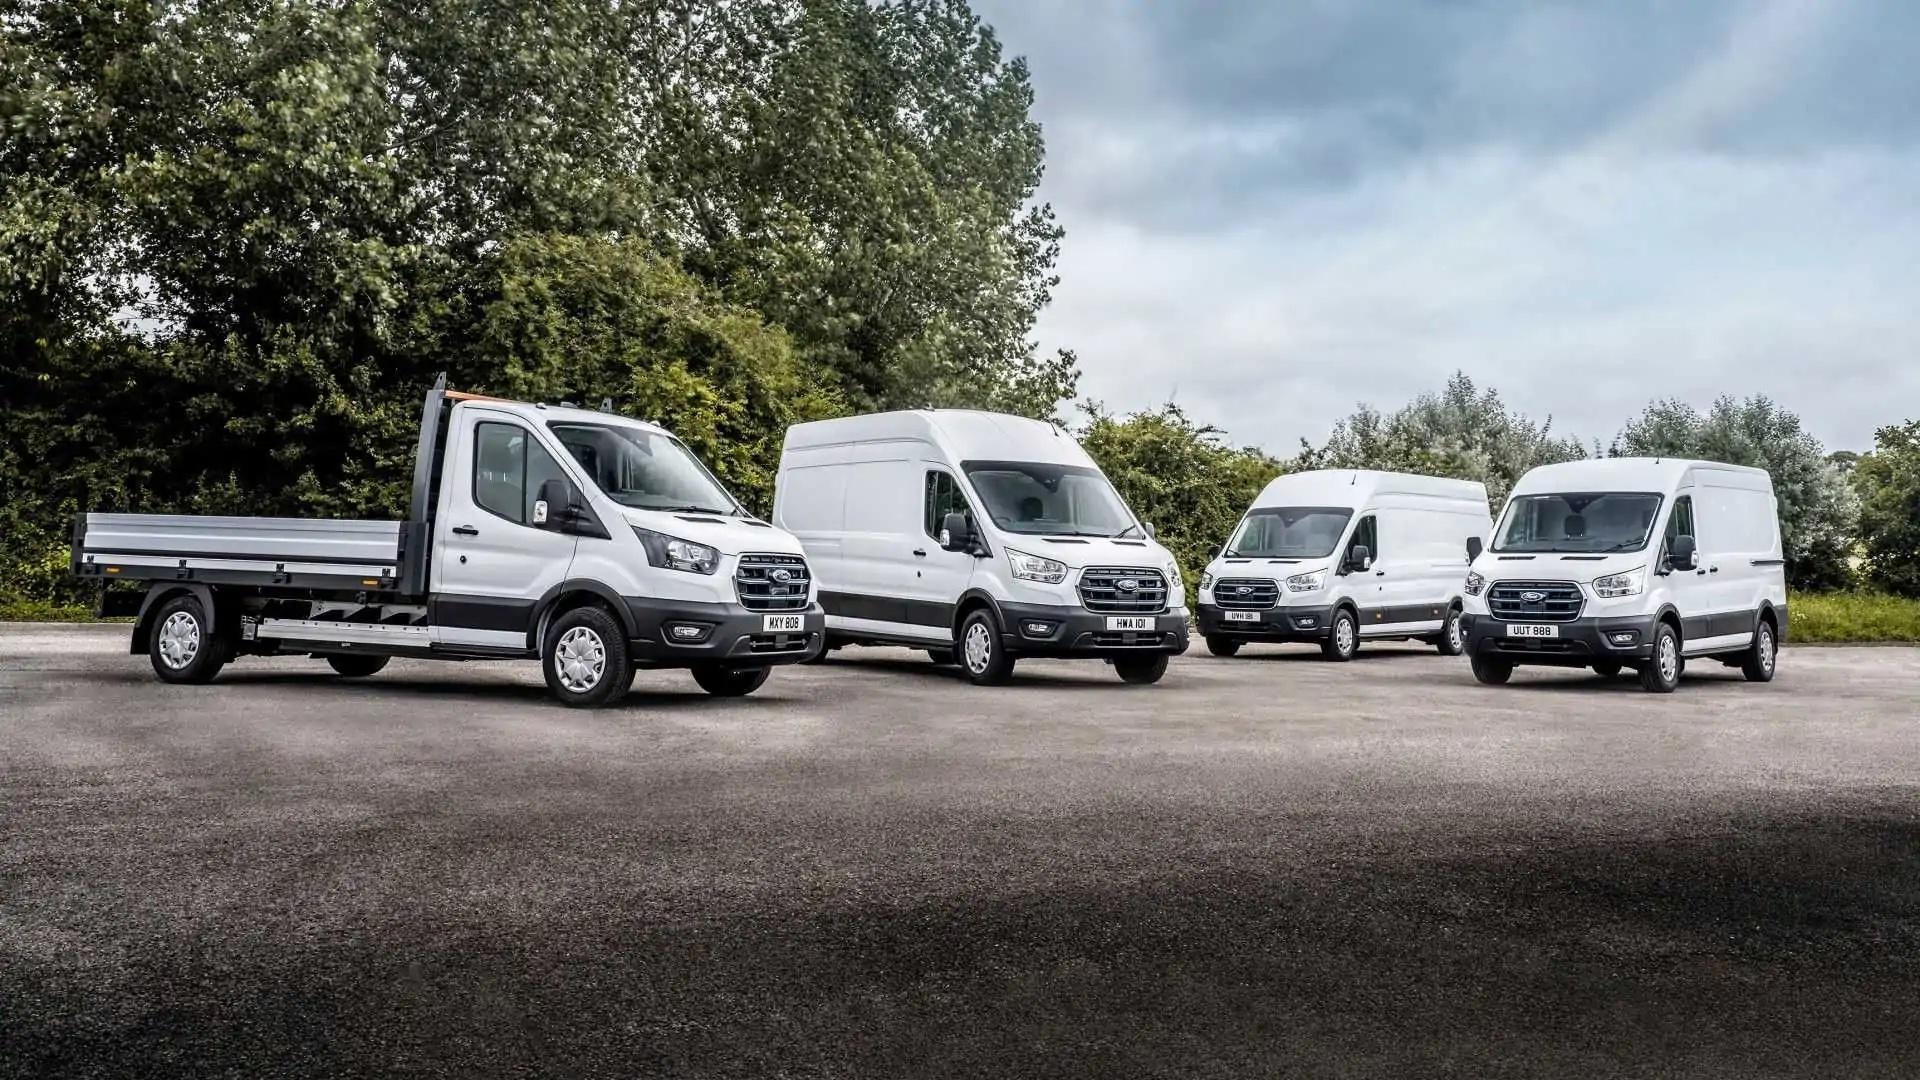 Ford E-Transit Vans Lined Up